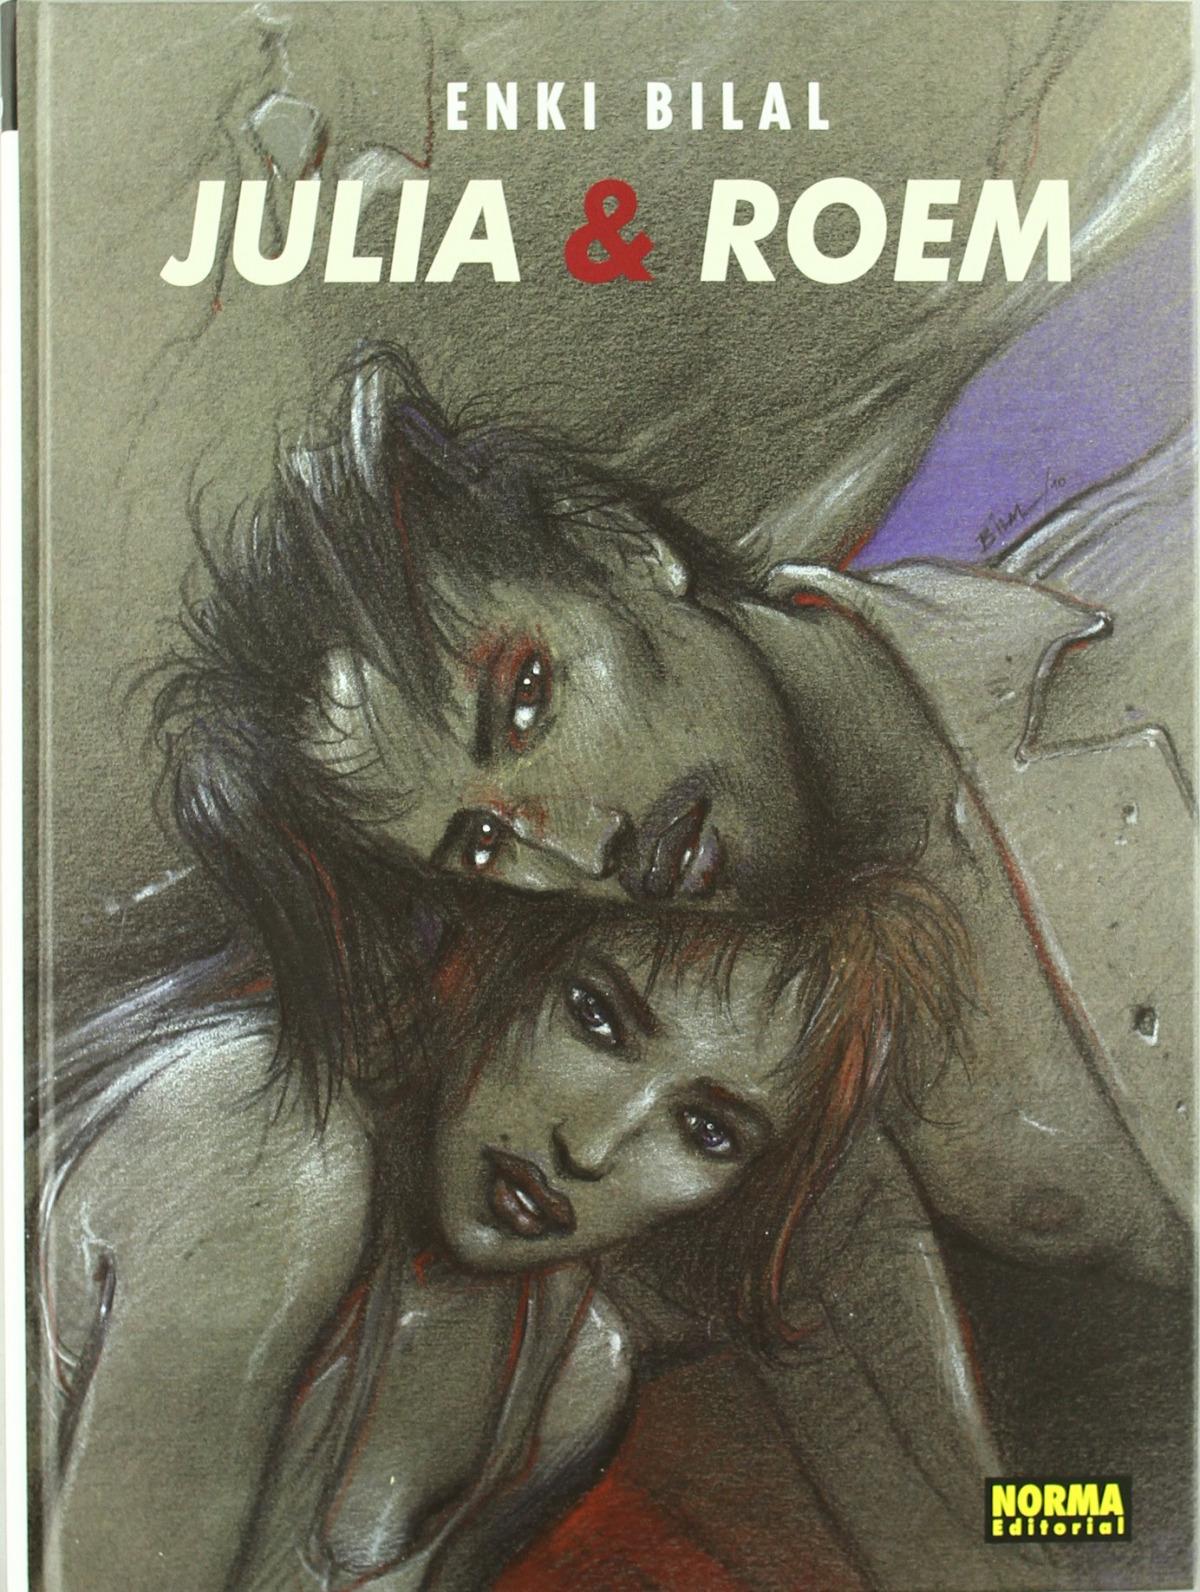 Julia & Roem